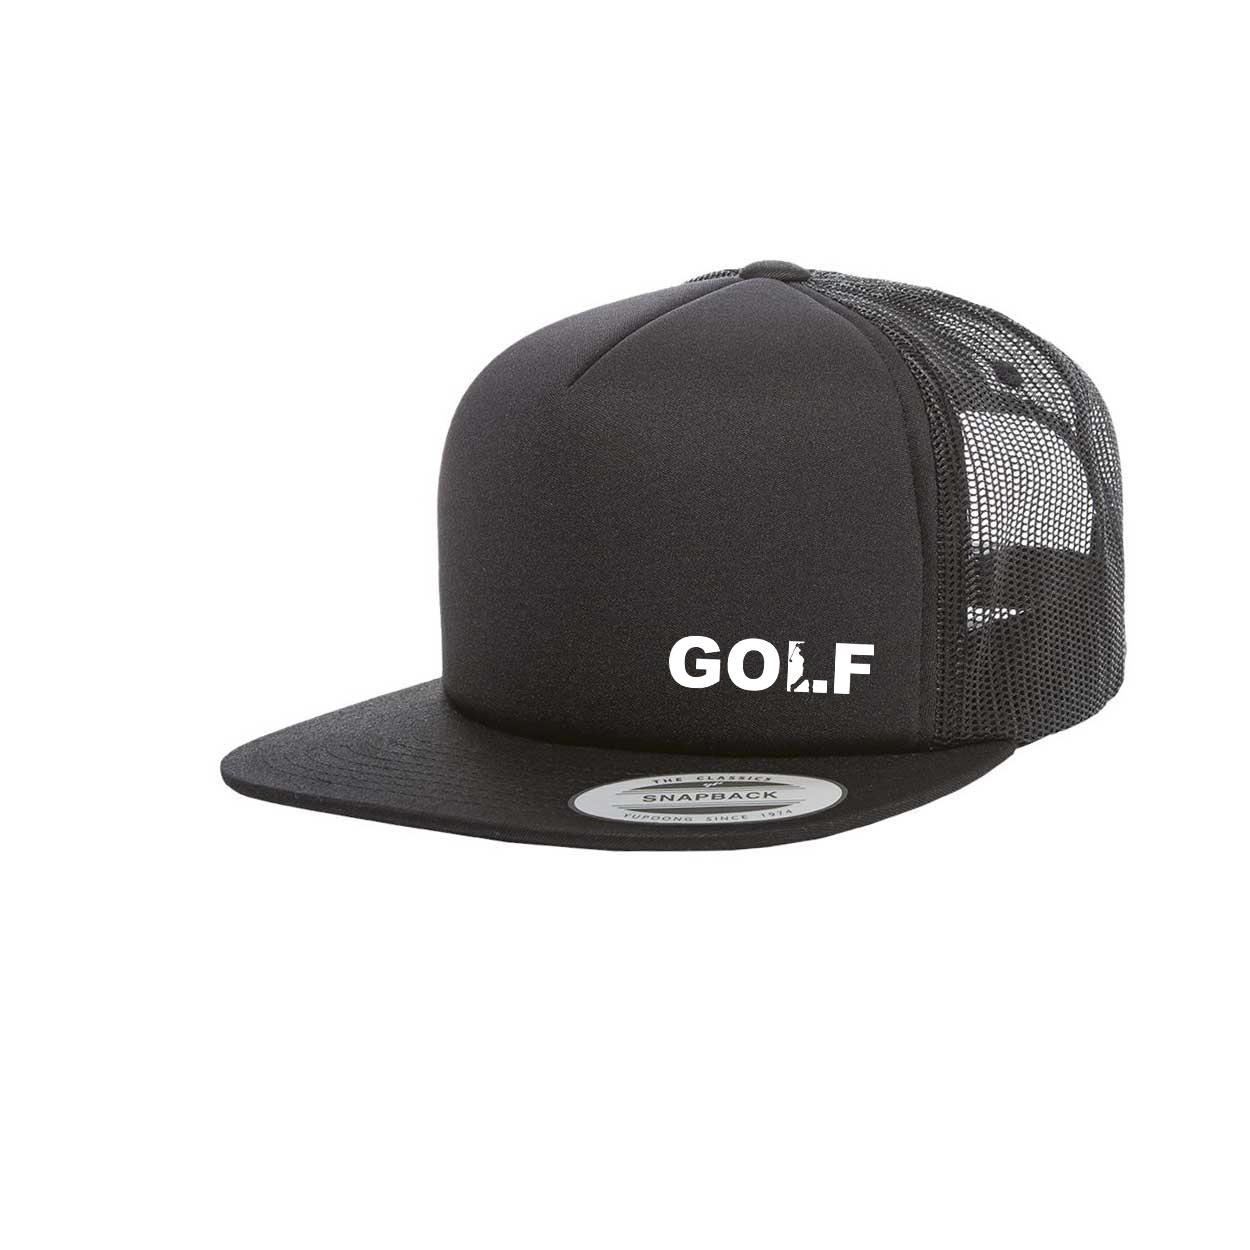 Golf Swing Logo Night Out Premium Foam Flat Brim Snapback Hat Black (White Logo)